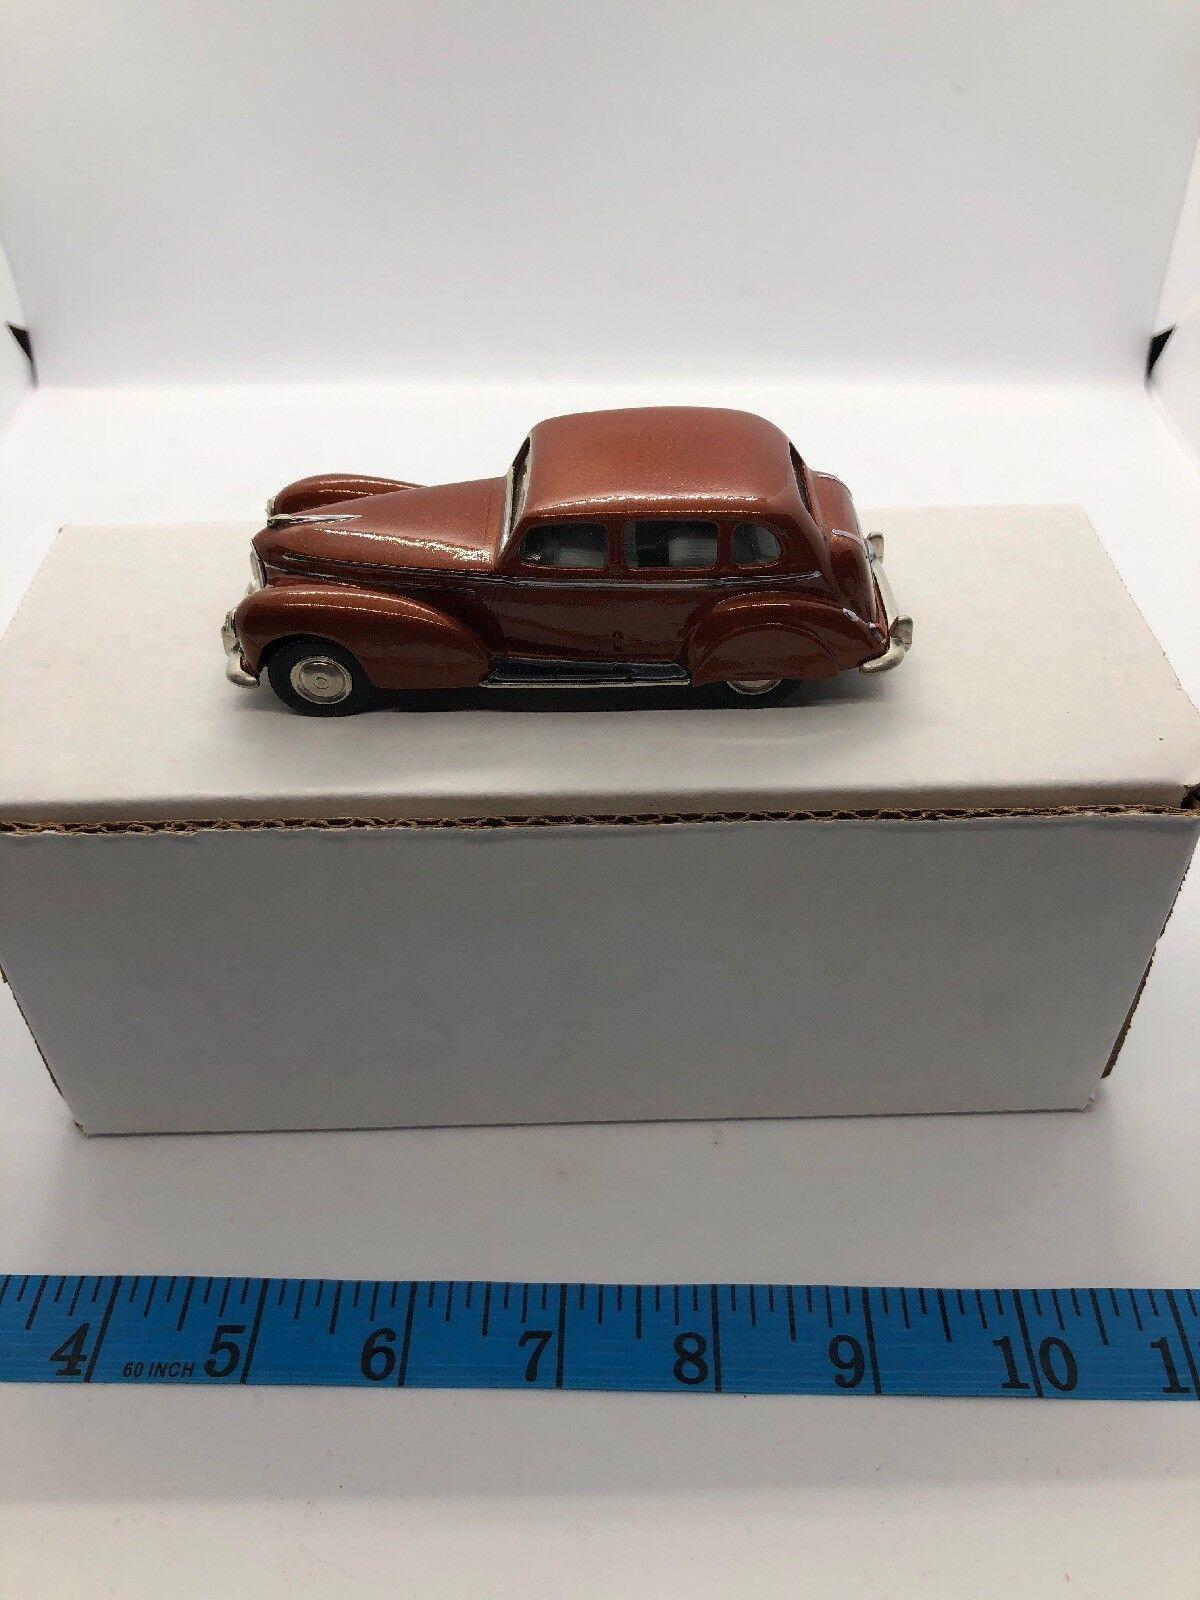 1 43 Sun Motor Company 1950 Humber Super Snipe Burnt Orange Rouille bronze Modèle